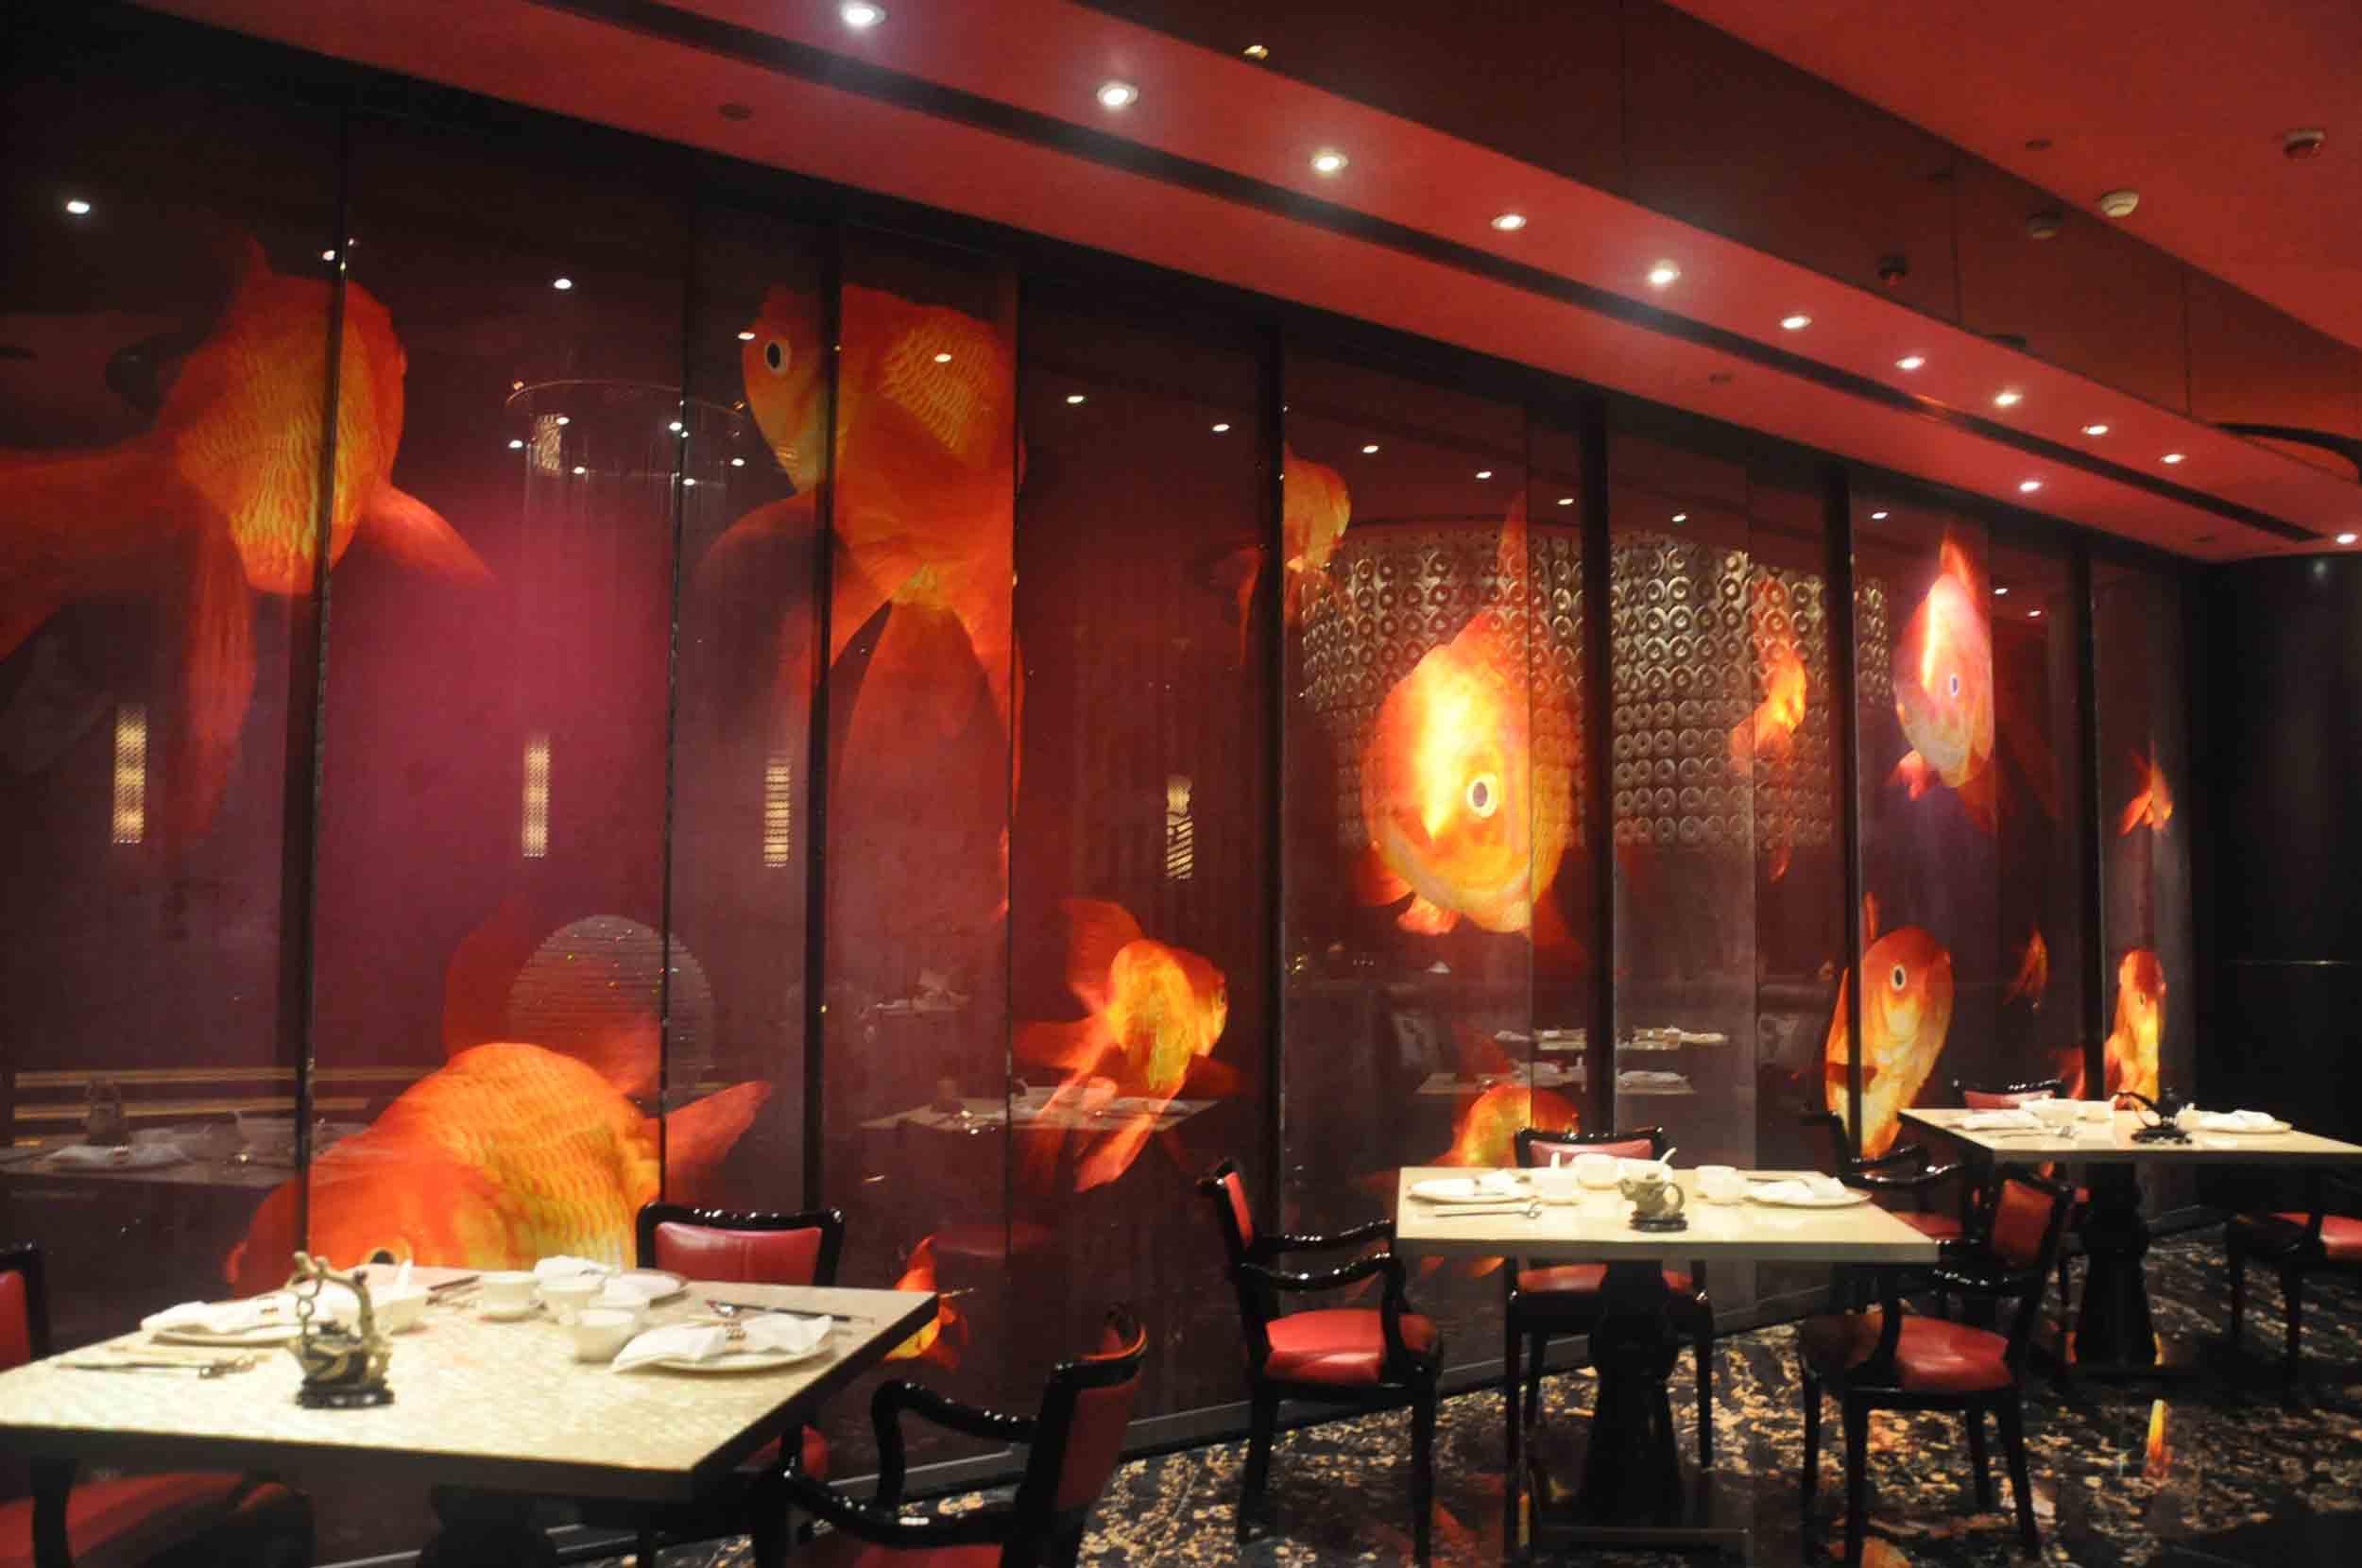 8 Restaurant Macau wall of fish